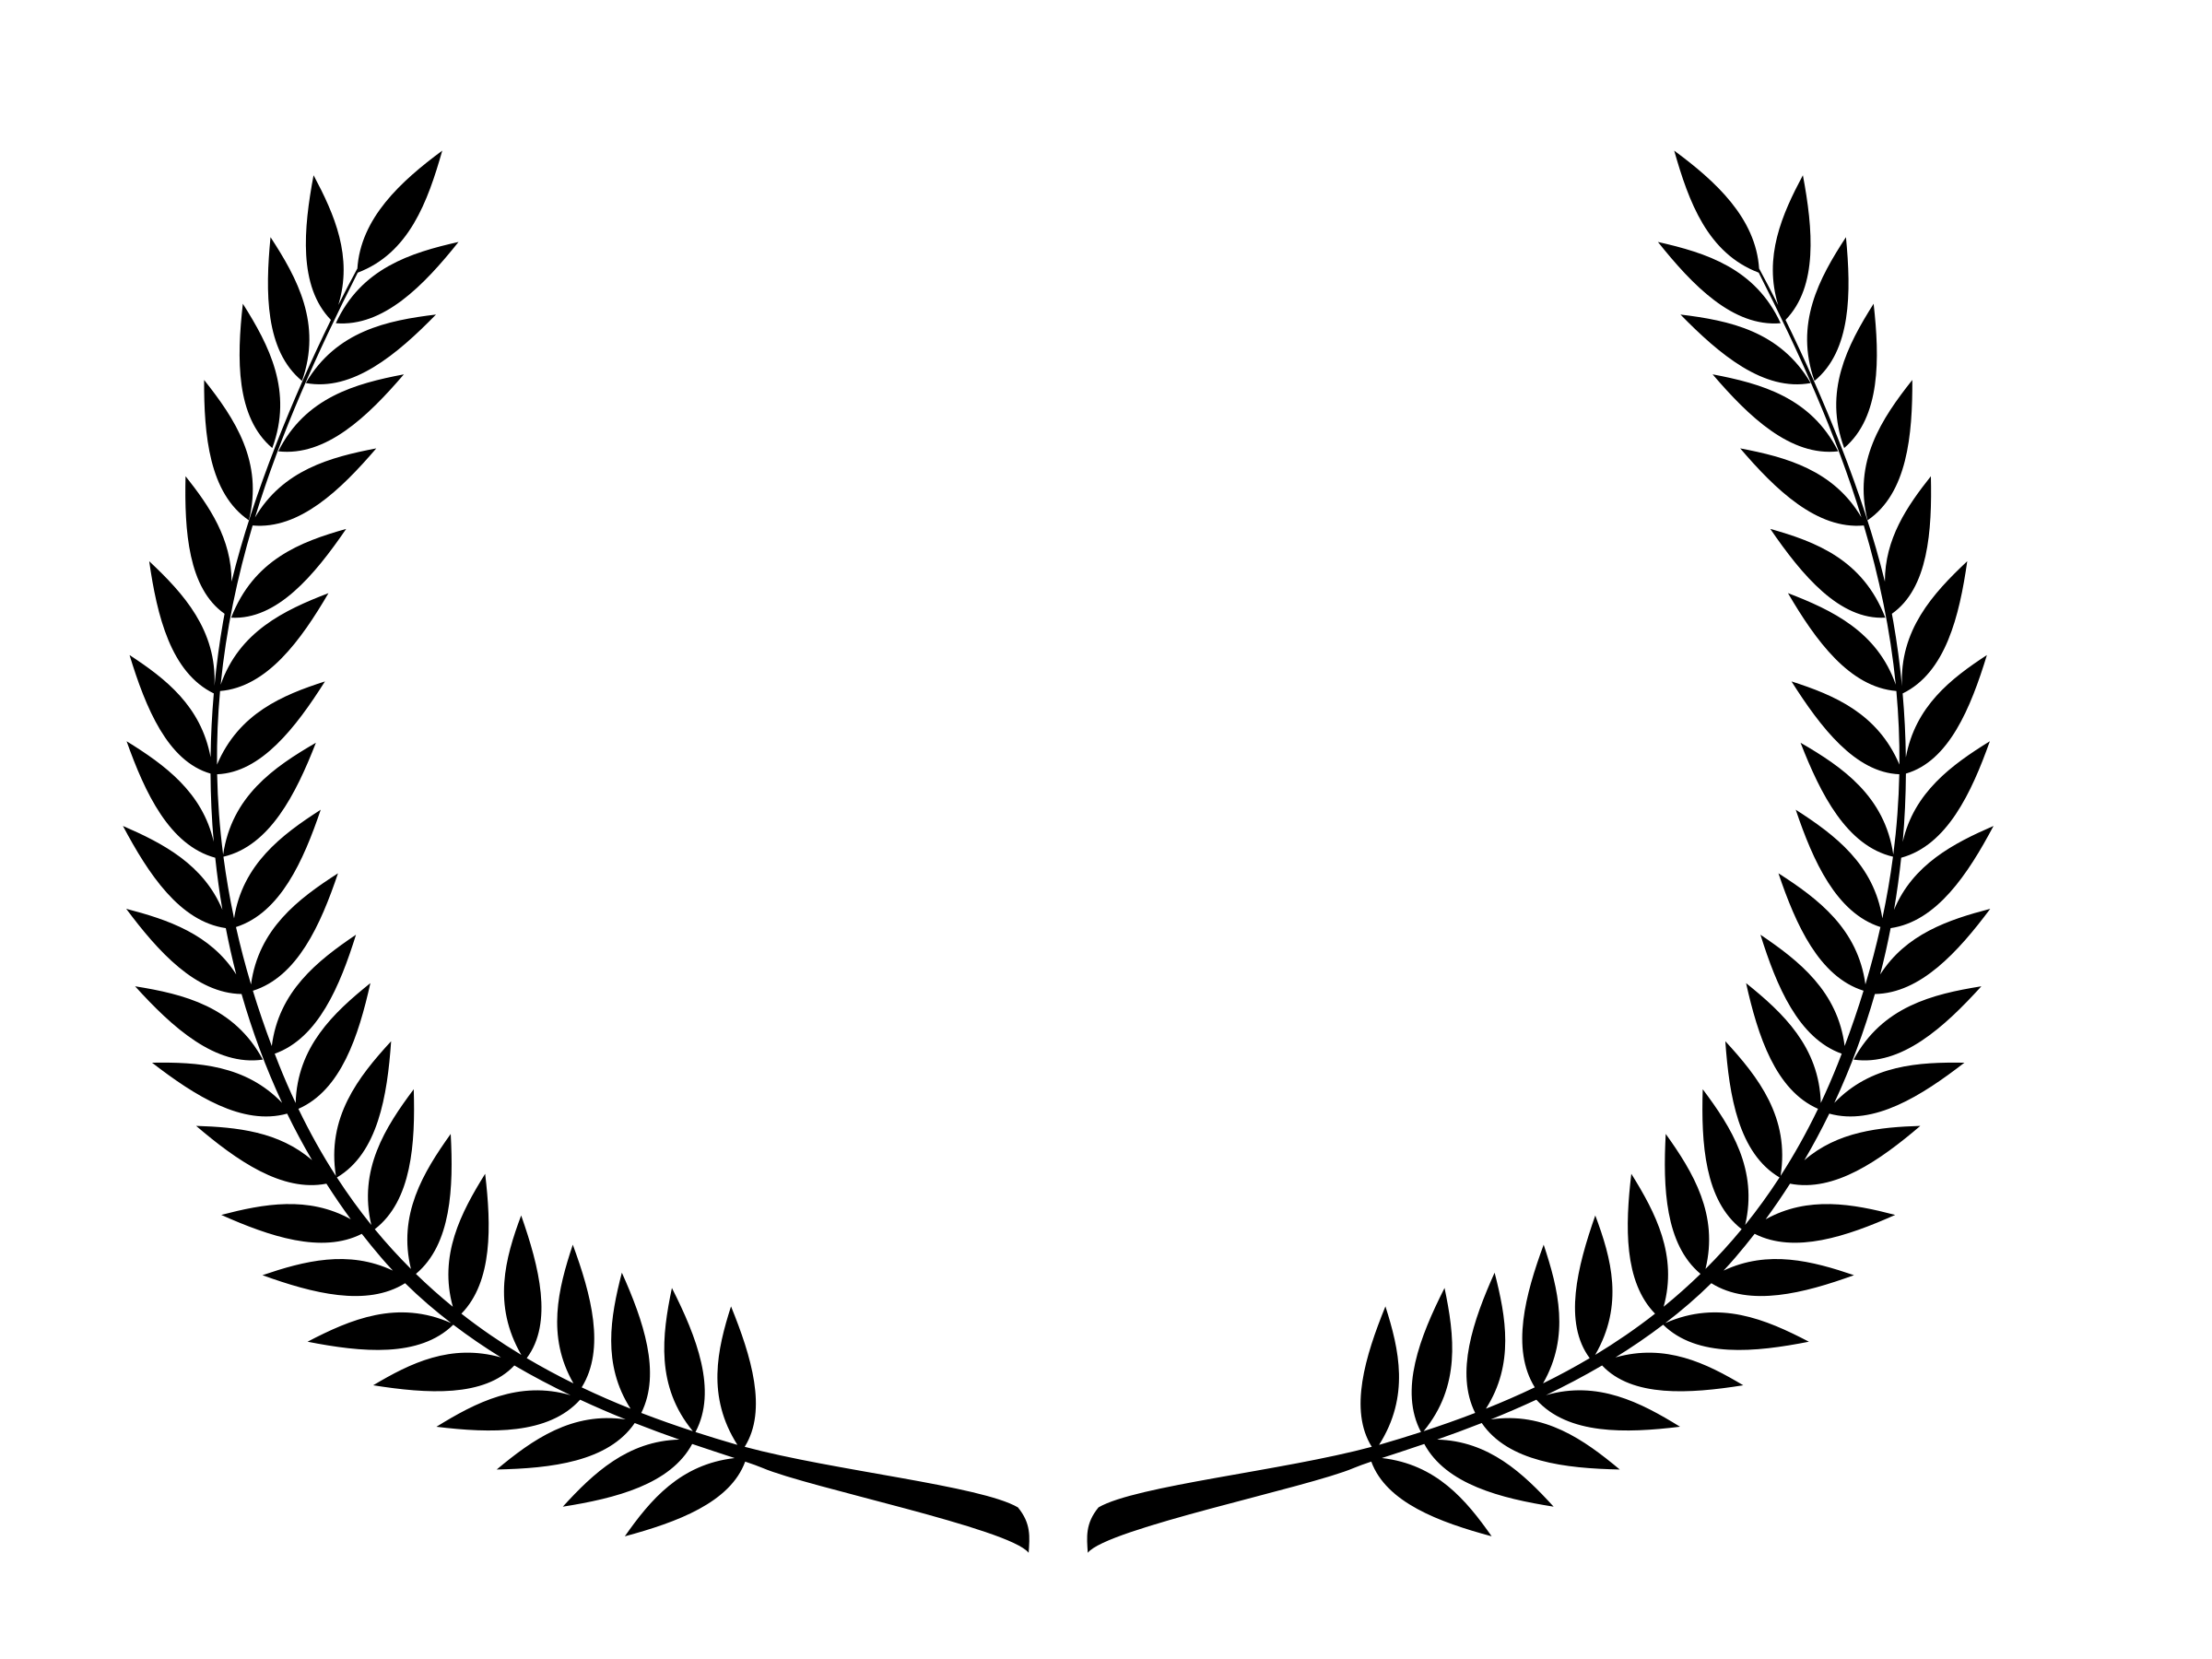 2400x1800 Laurel Wreath (Black) Icons Png